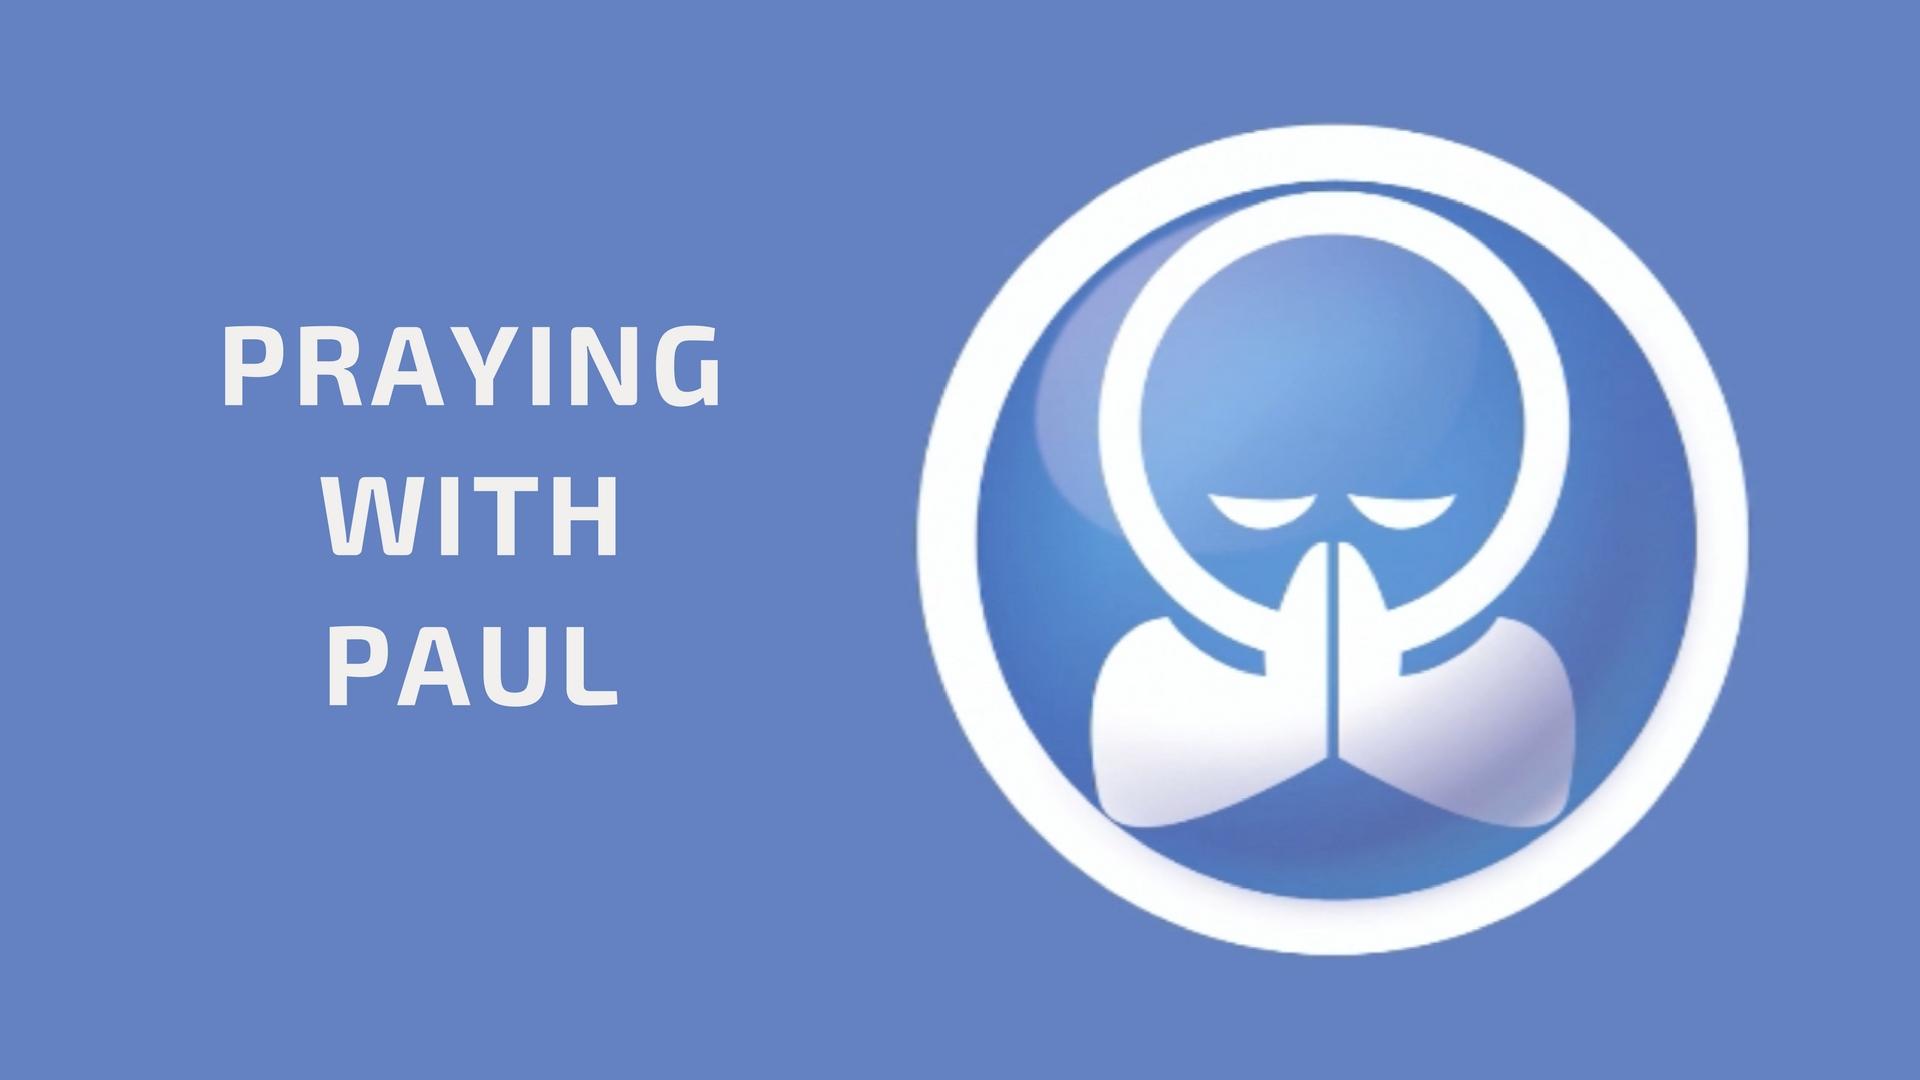 PRAYING WITH PAUL - JANUARY 2018